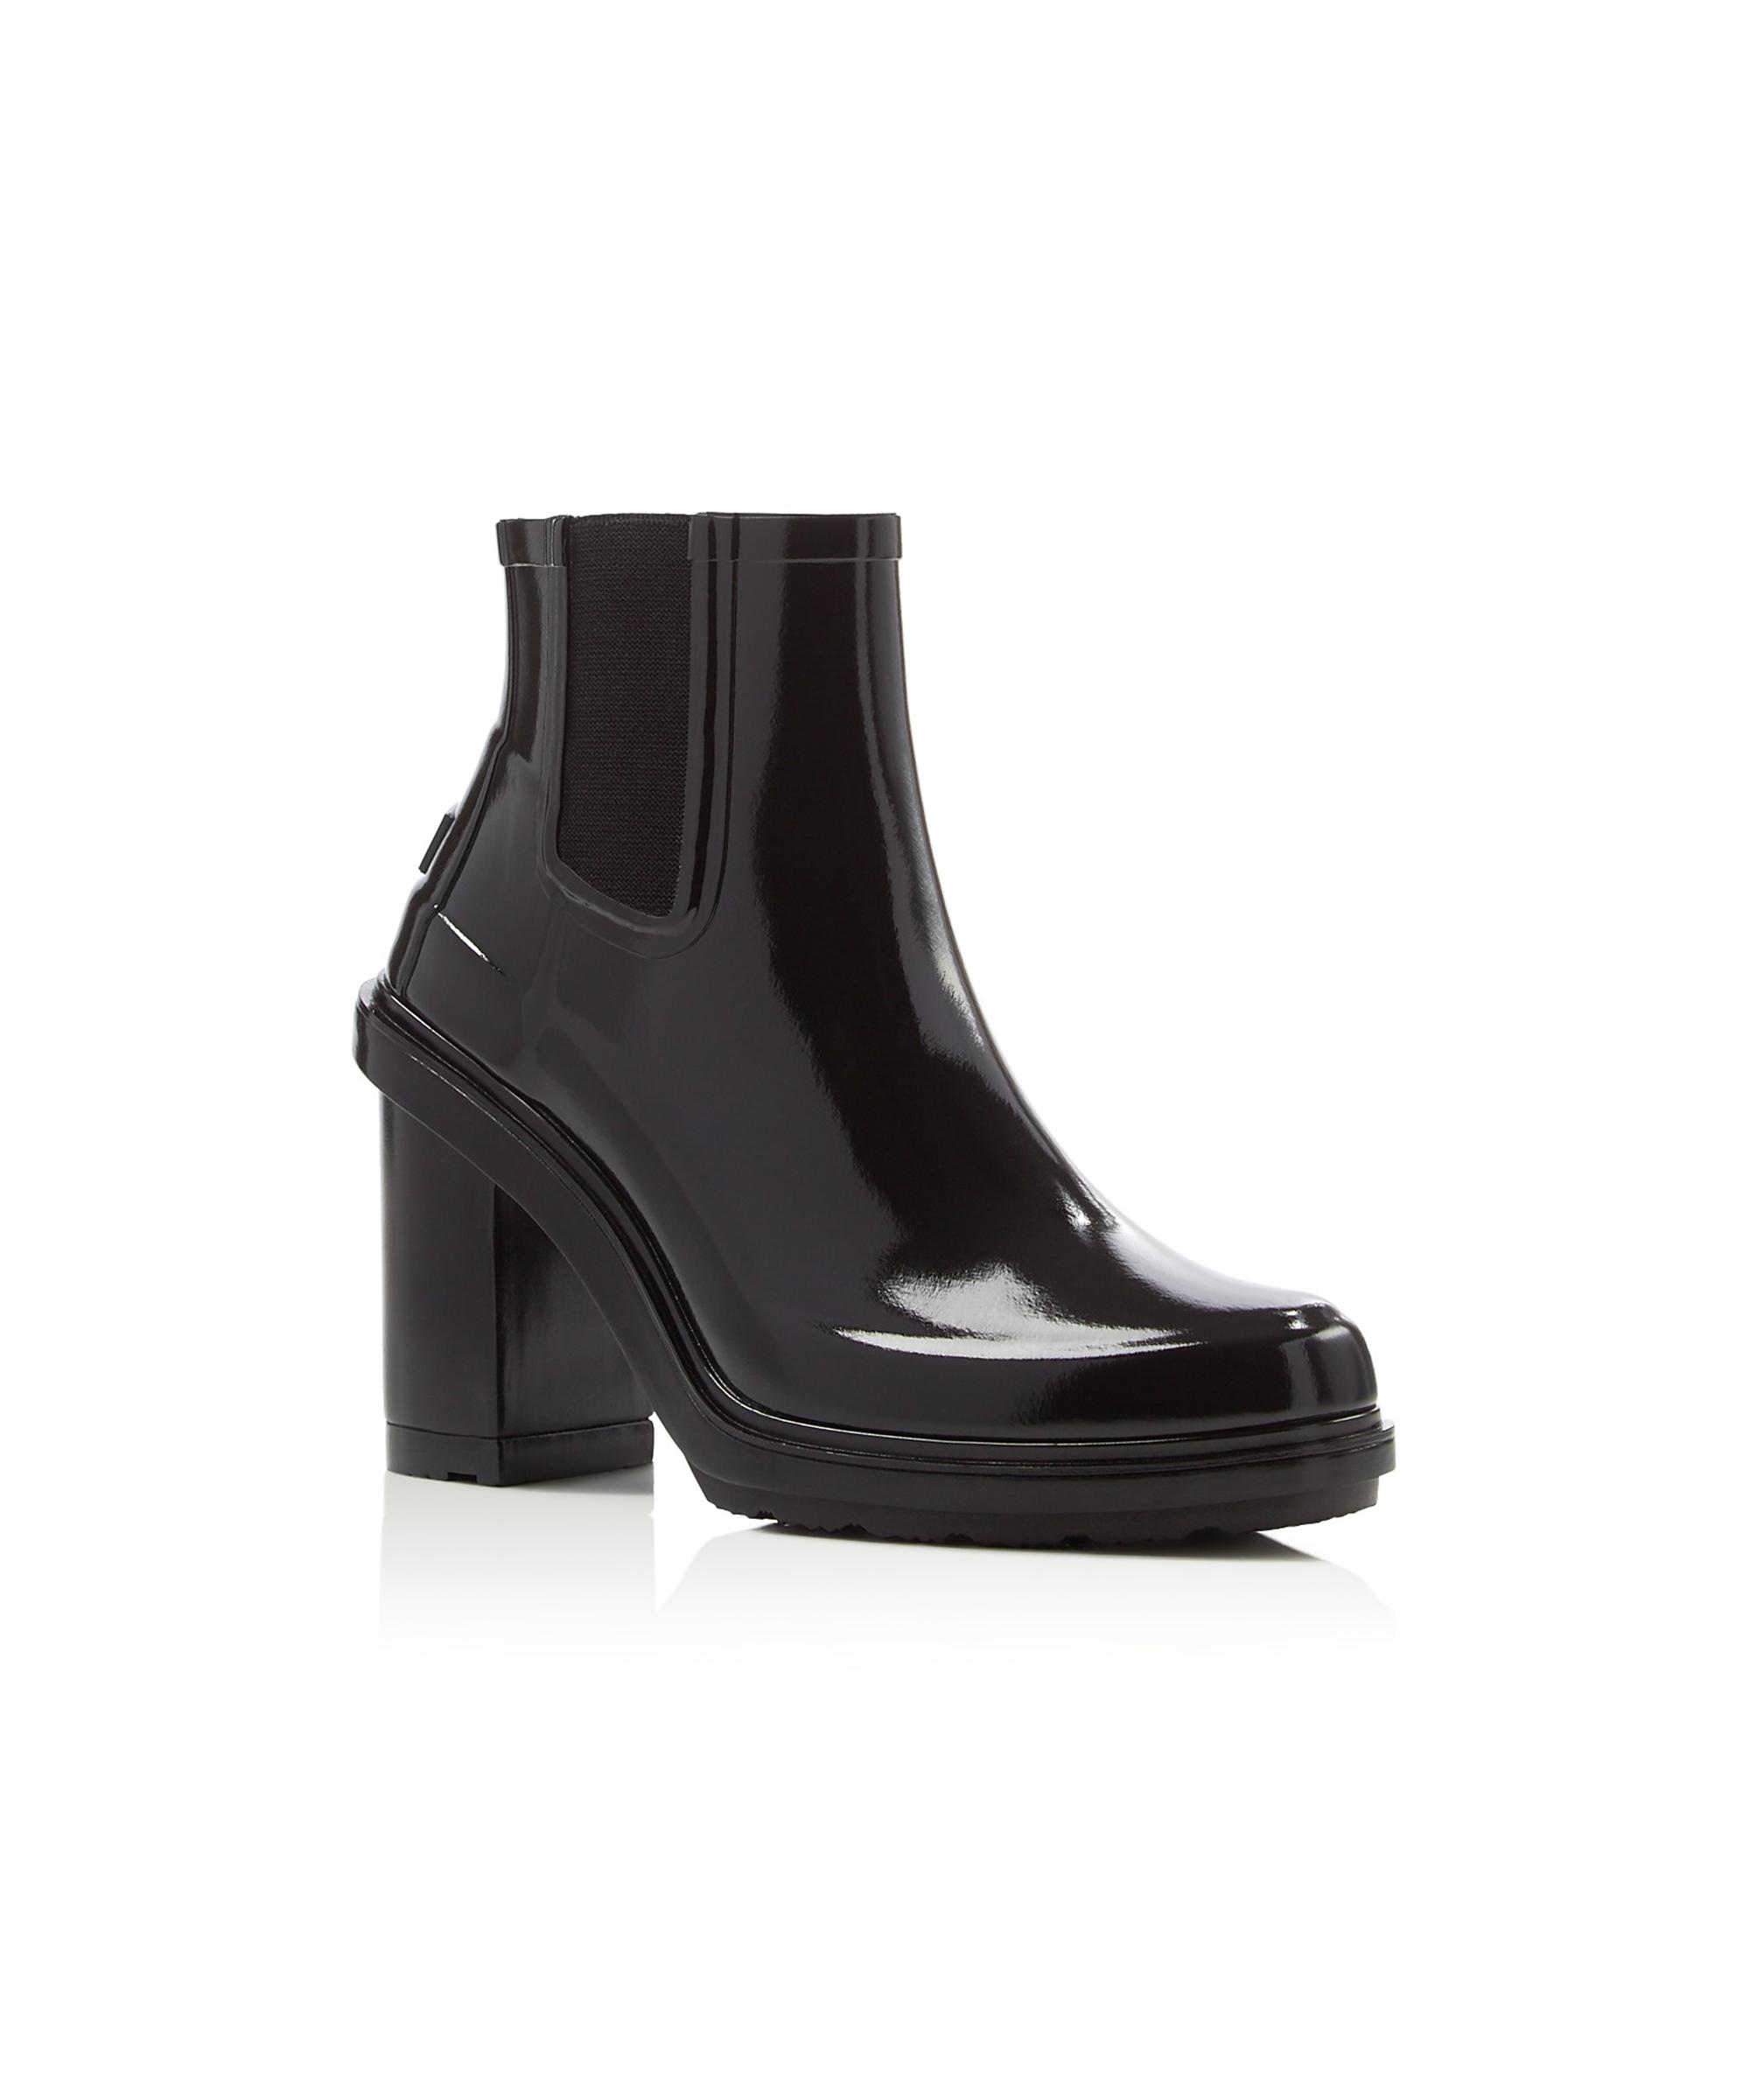 buy online 13136 e1fca Women's Original Refined High Heel Rain Boots